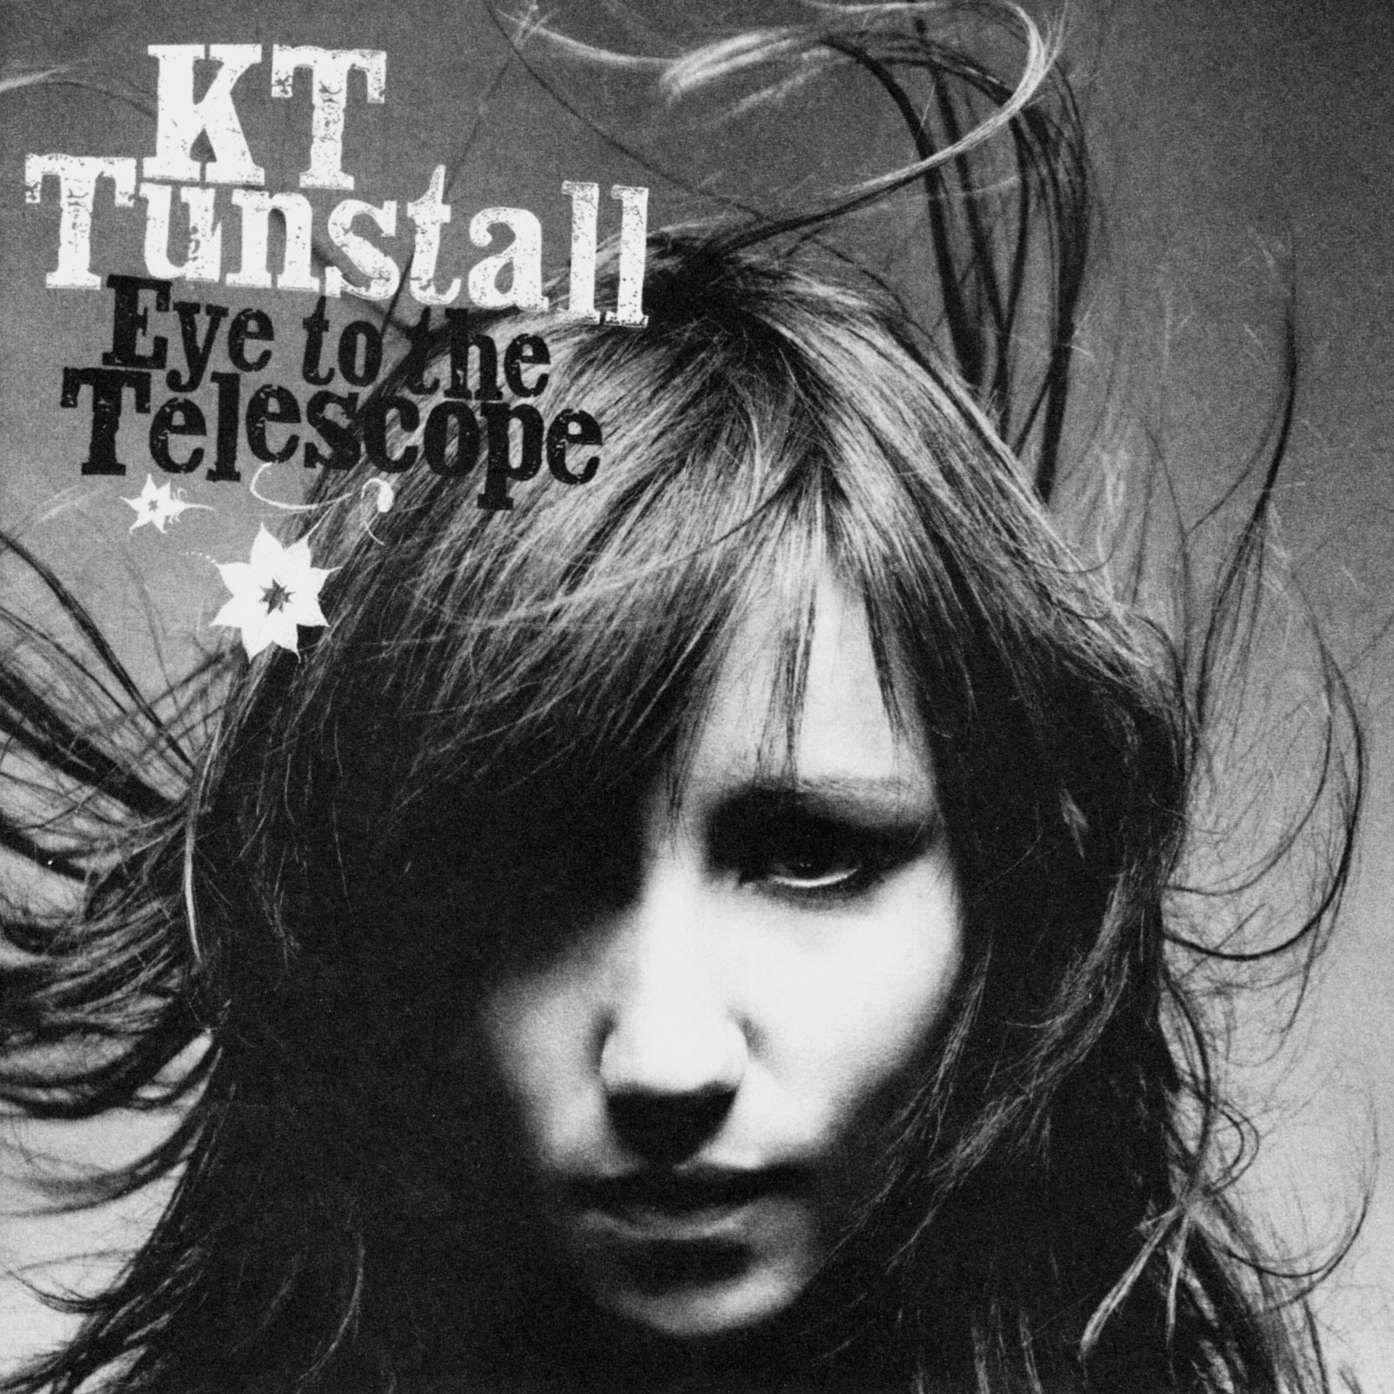 KT Tunstall - Eye To The Telescope album cover